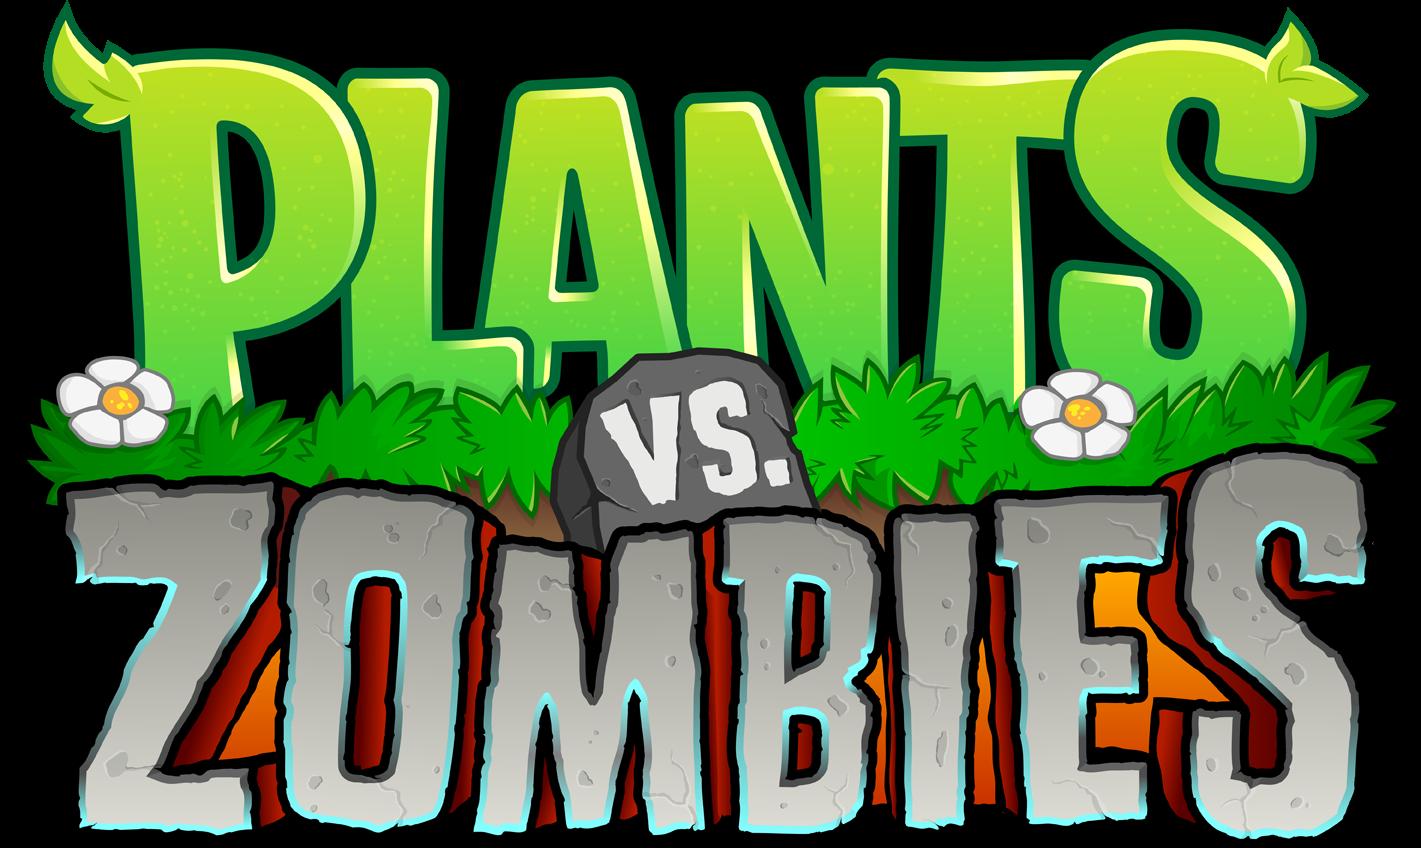 Plantas vs Zombies [Español] [Full] [Userscloud]